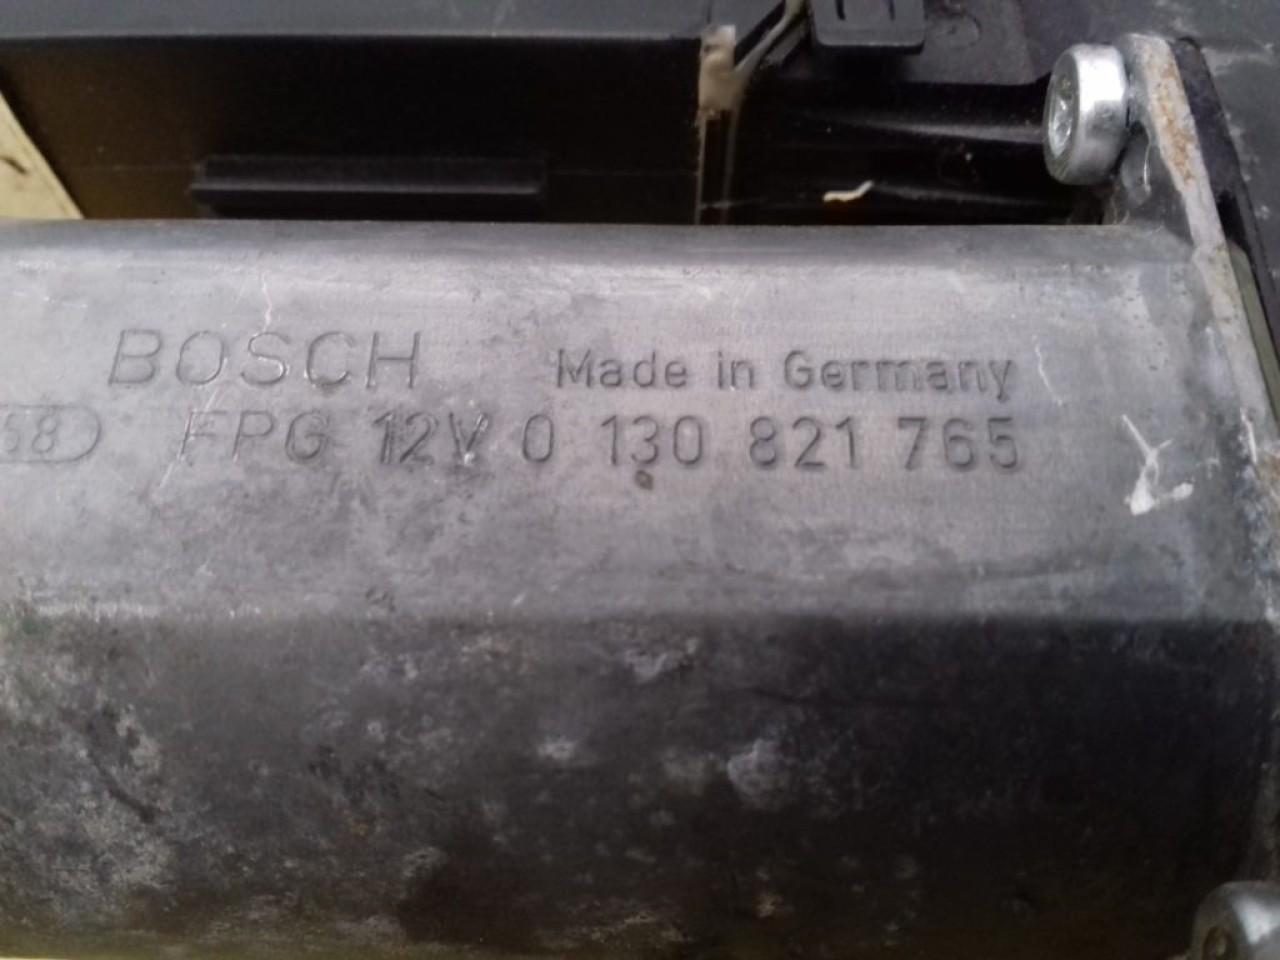 Motoras Macara Stanga Spate Vw Touareg, 3D0959795F, 0130821765